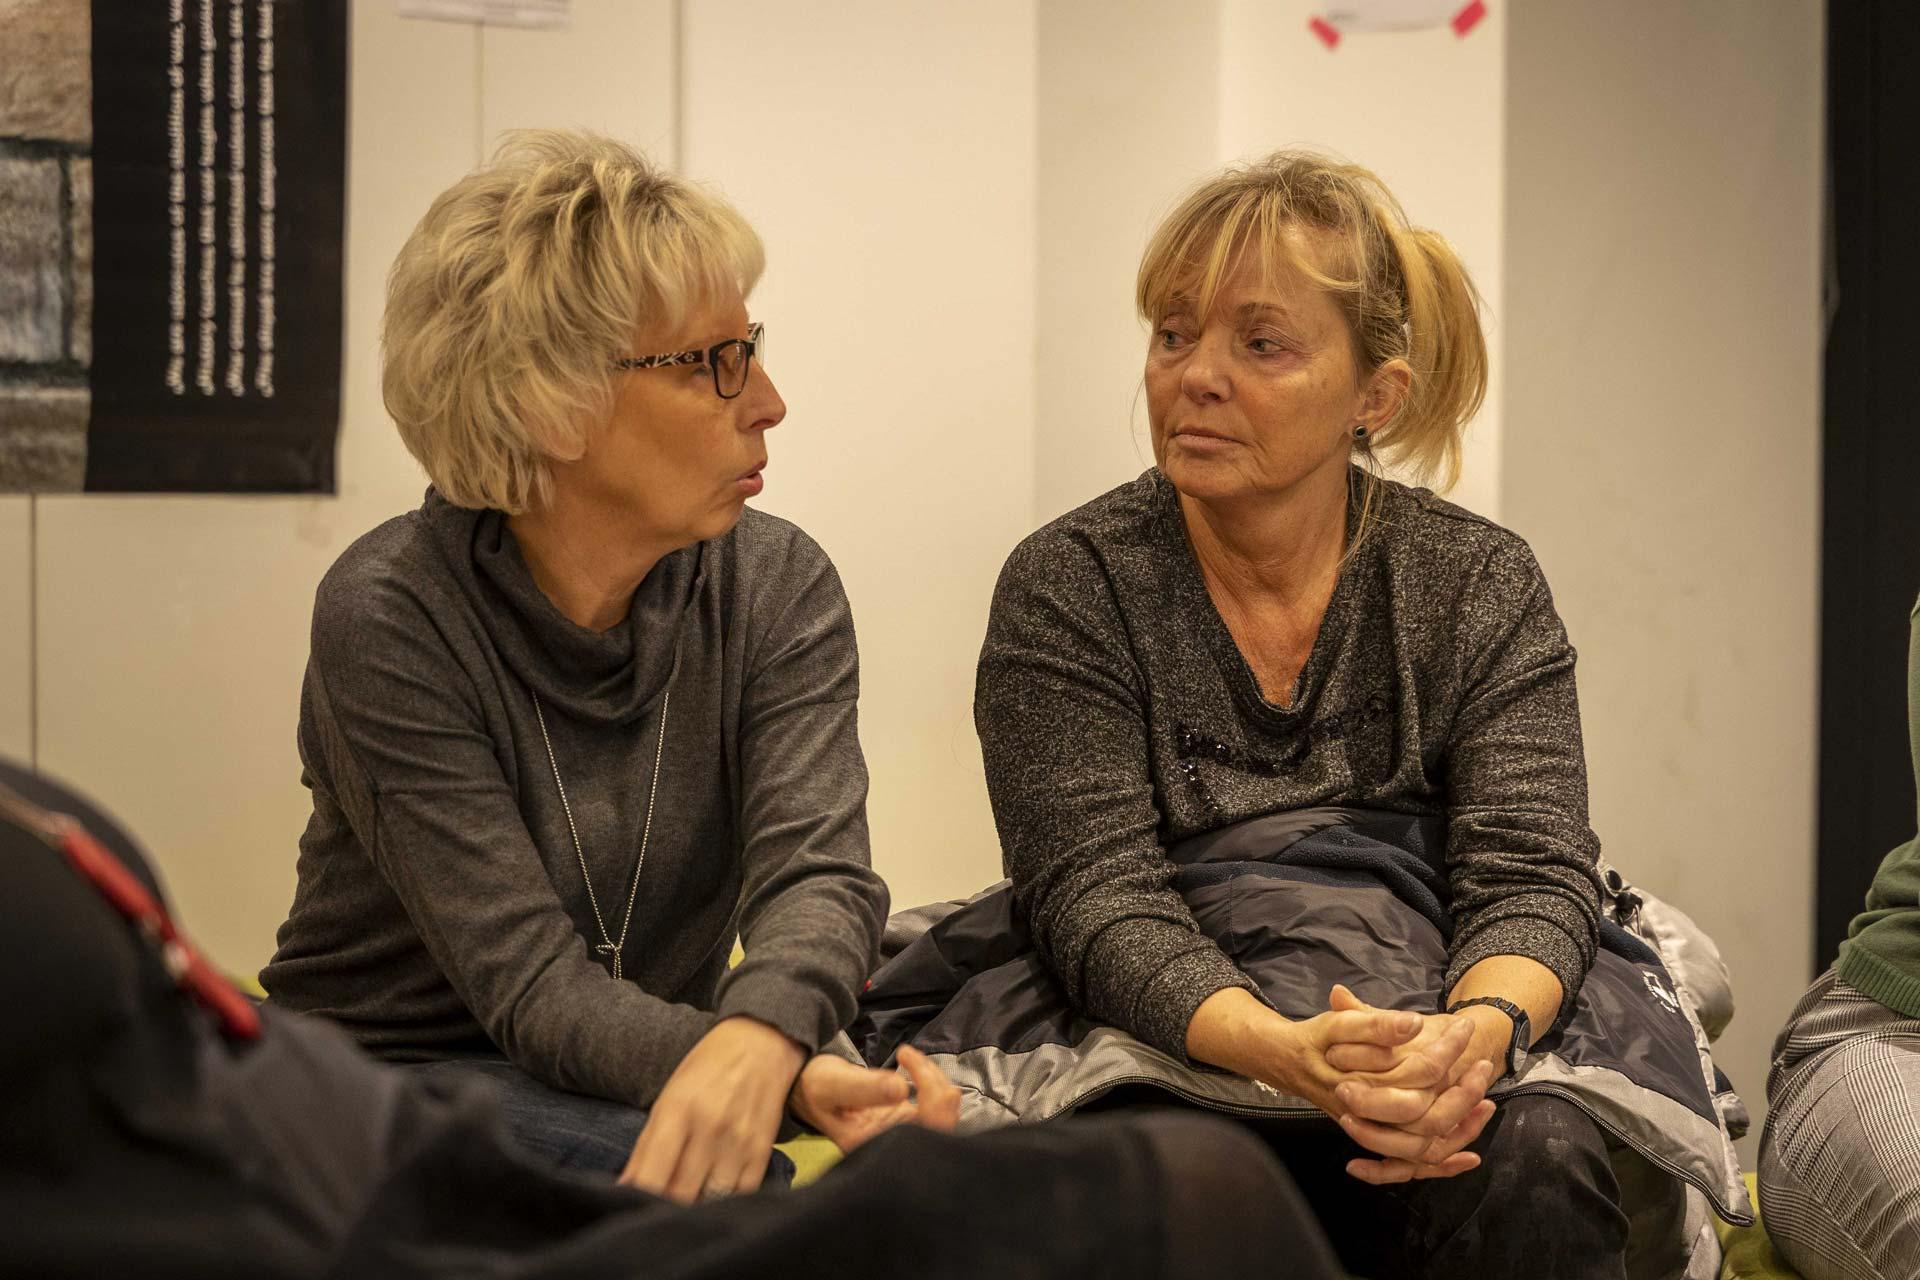 Revolutionale 2019 - Karstadt-Frauen - Foto: Roland Quester